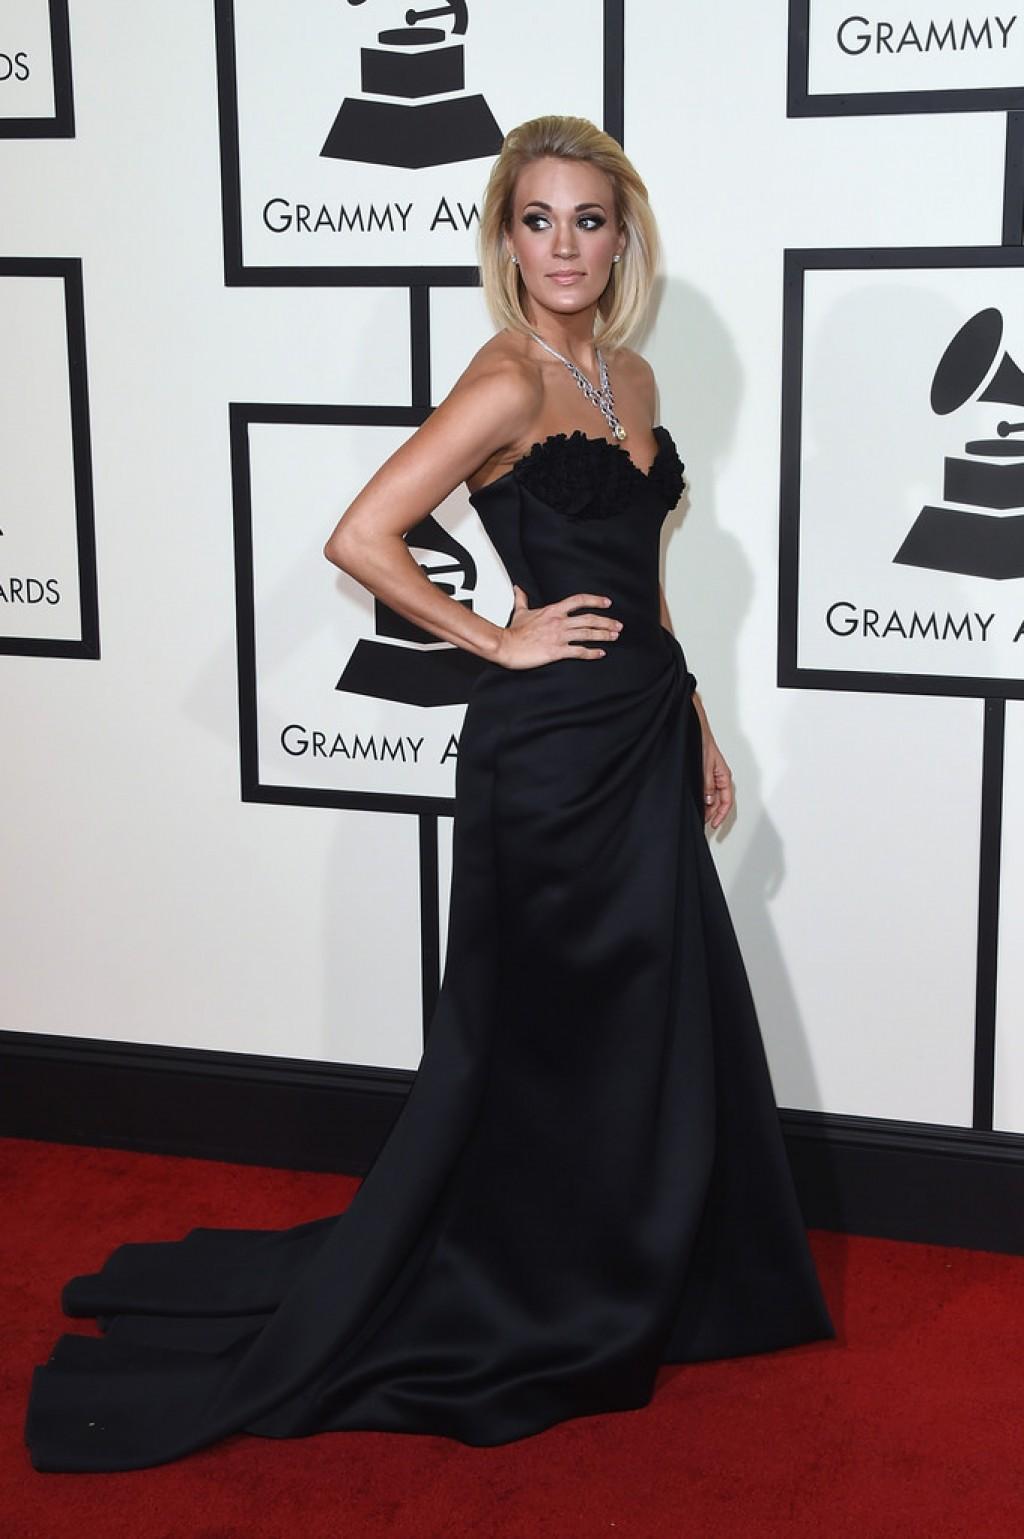 Carrie-Underwood-Wearing-Nicolas-Jebran-2016-Grammys-dress-1024x1539